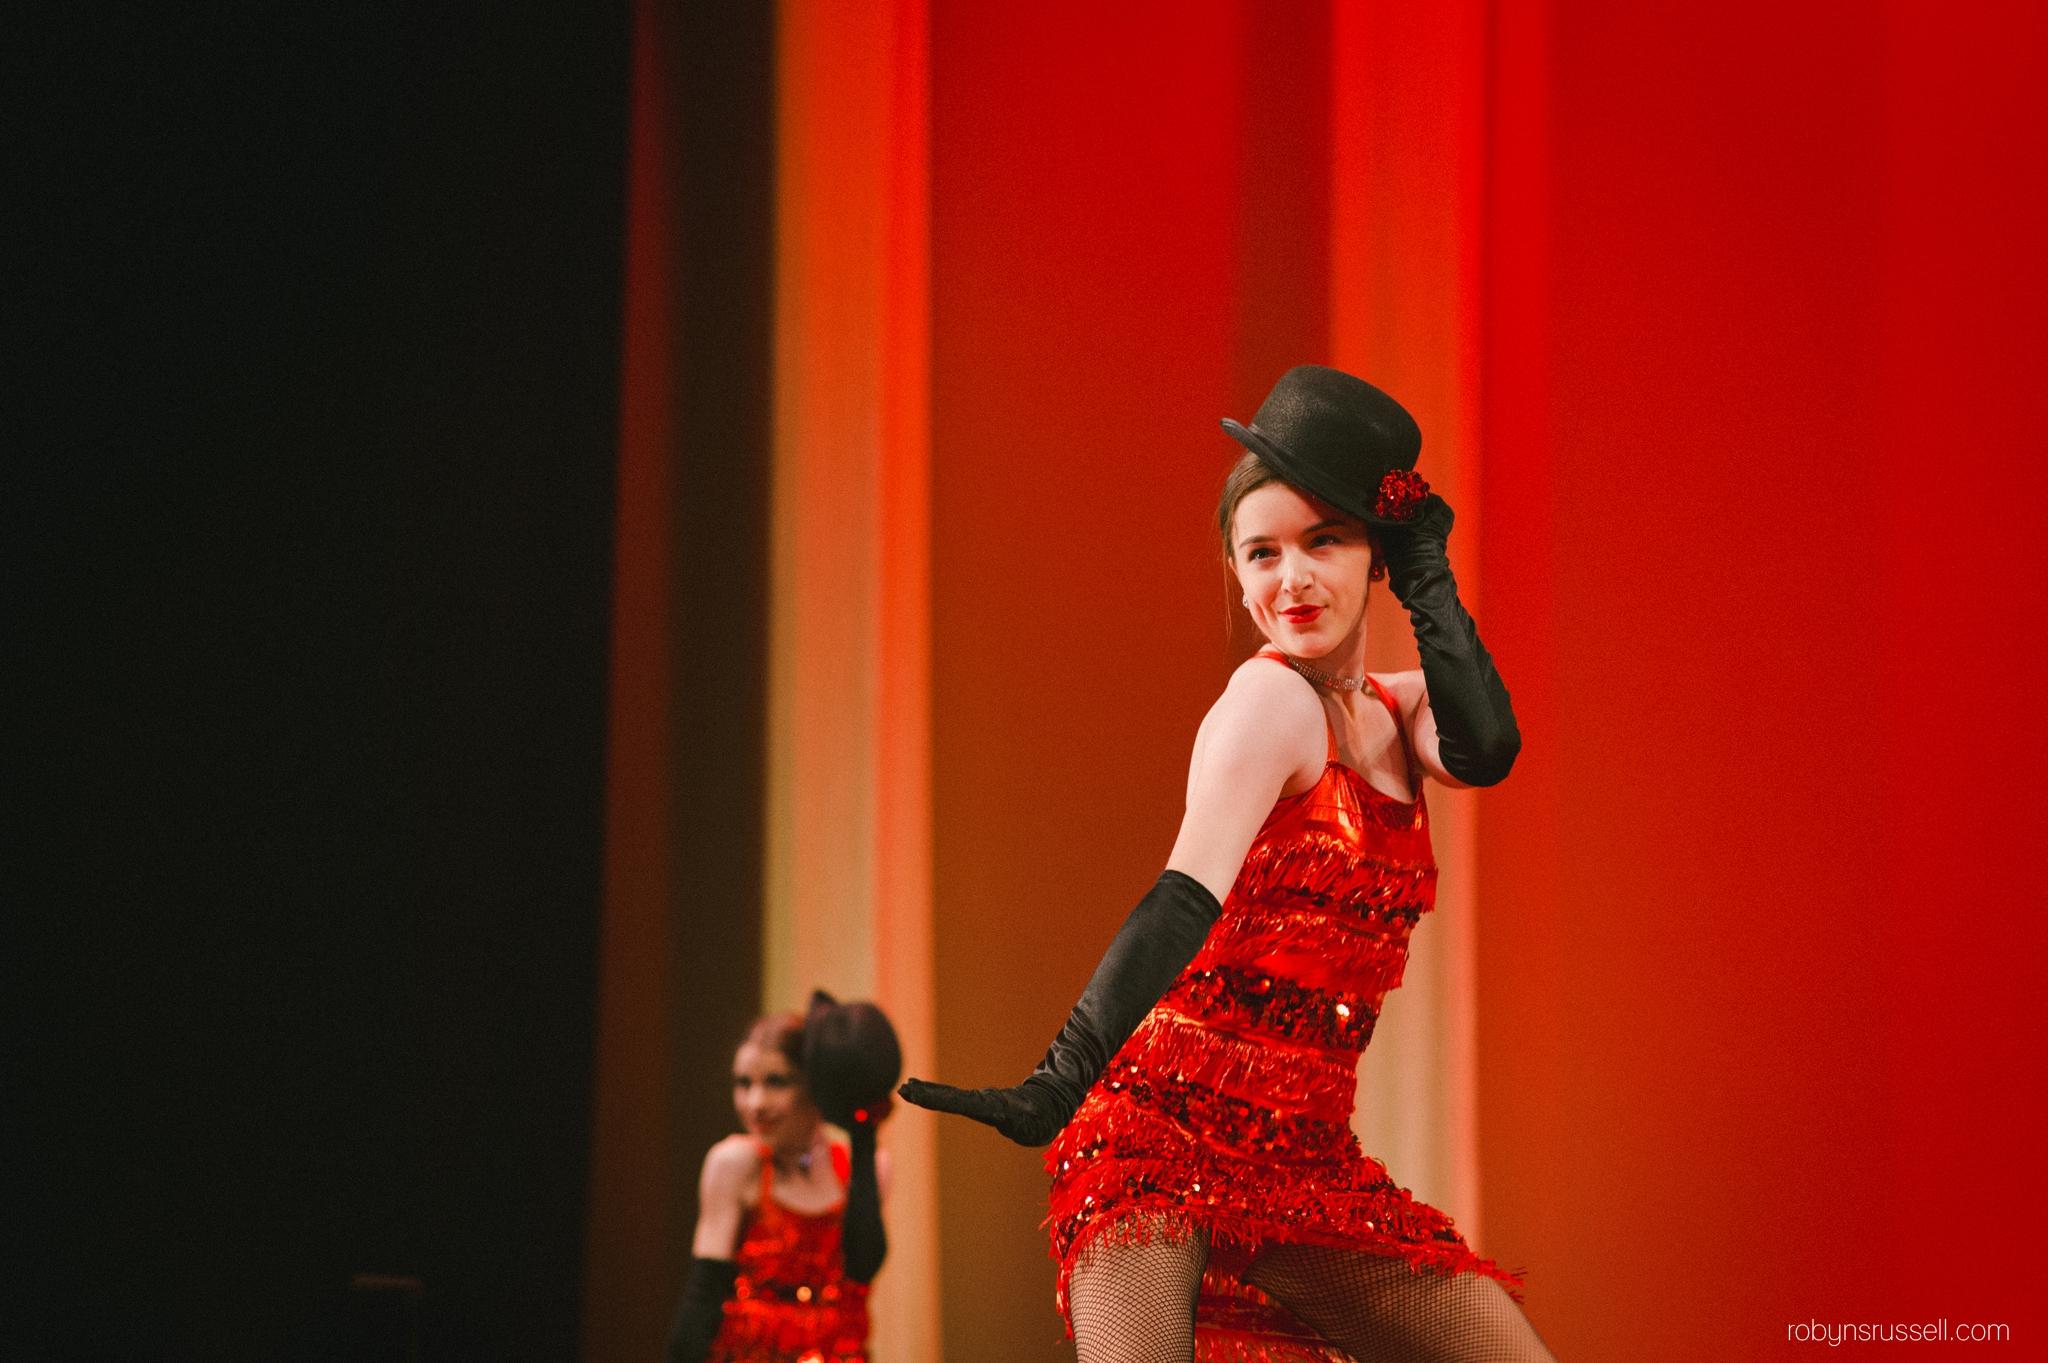 13-sassy-dancer-cabaret-bdc-rehearsals.jpg